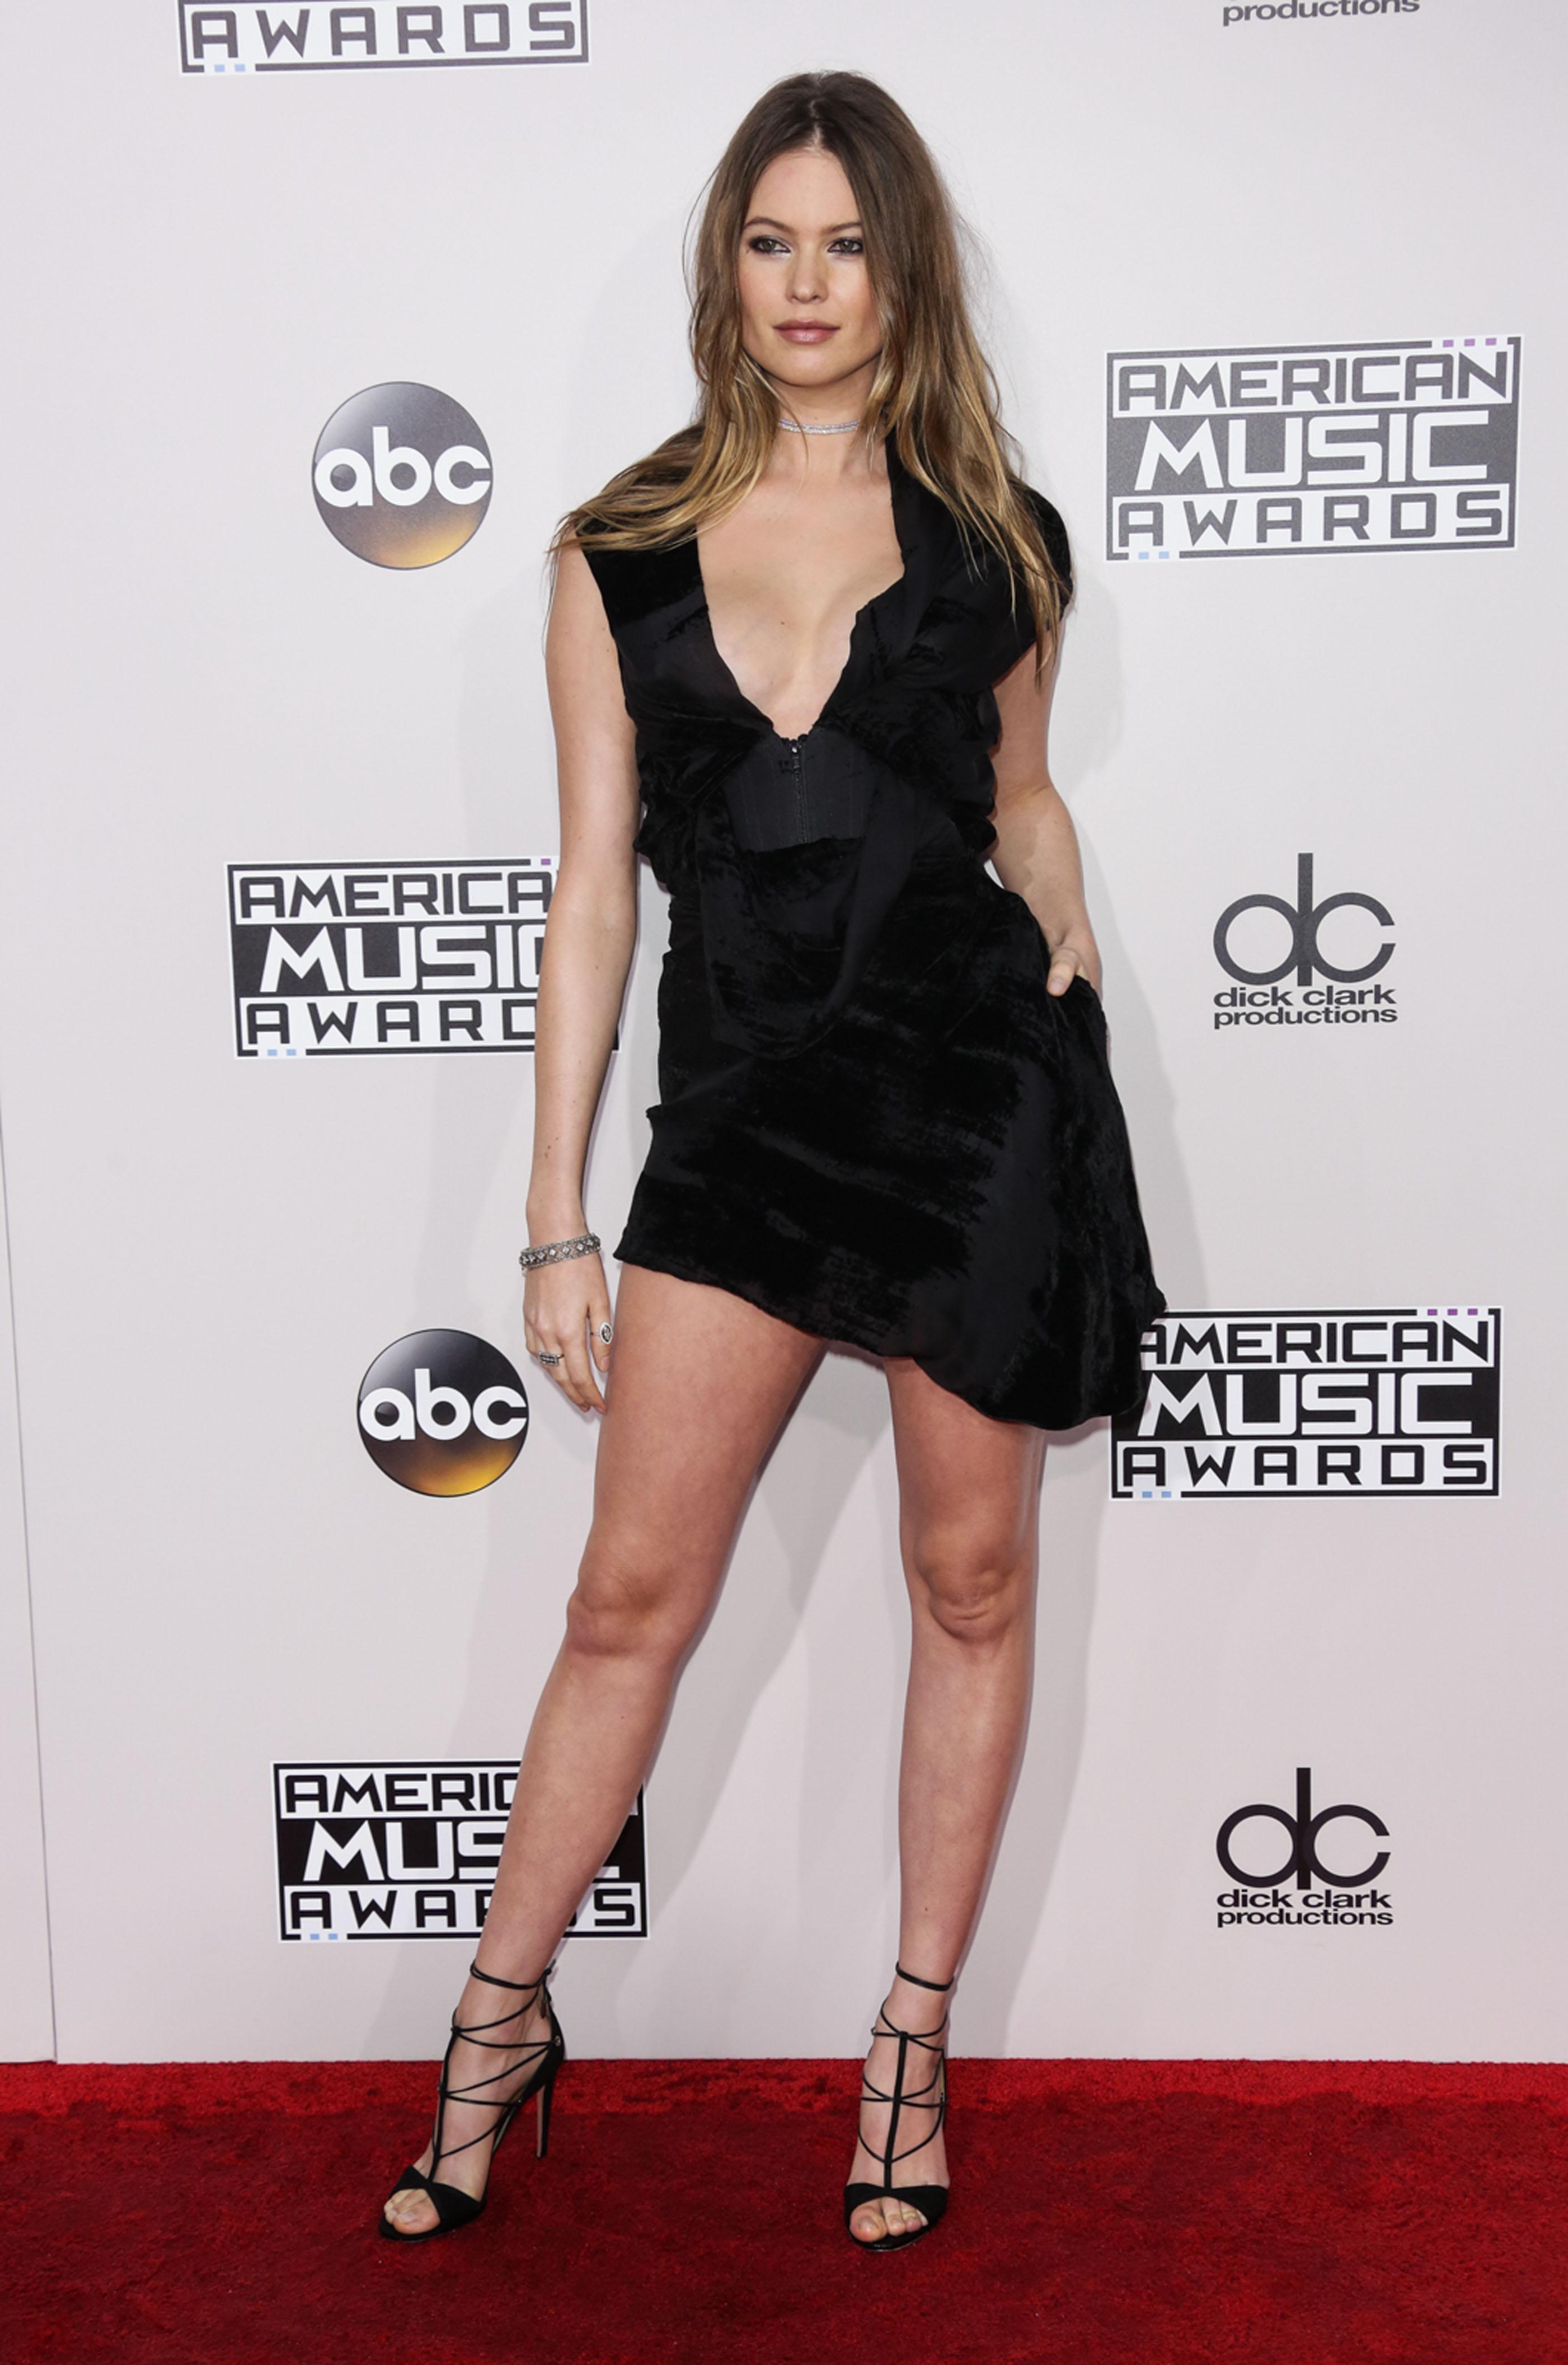 Model Behati Prinsloo arrives on the Red carpet at 2016 American Music Awards (Photo credit: Splash News)